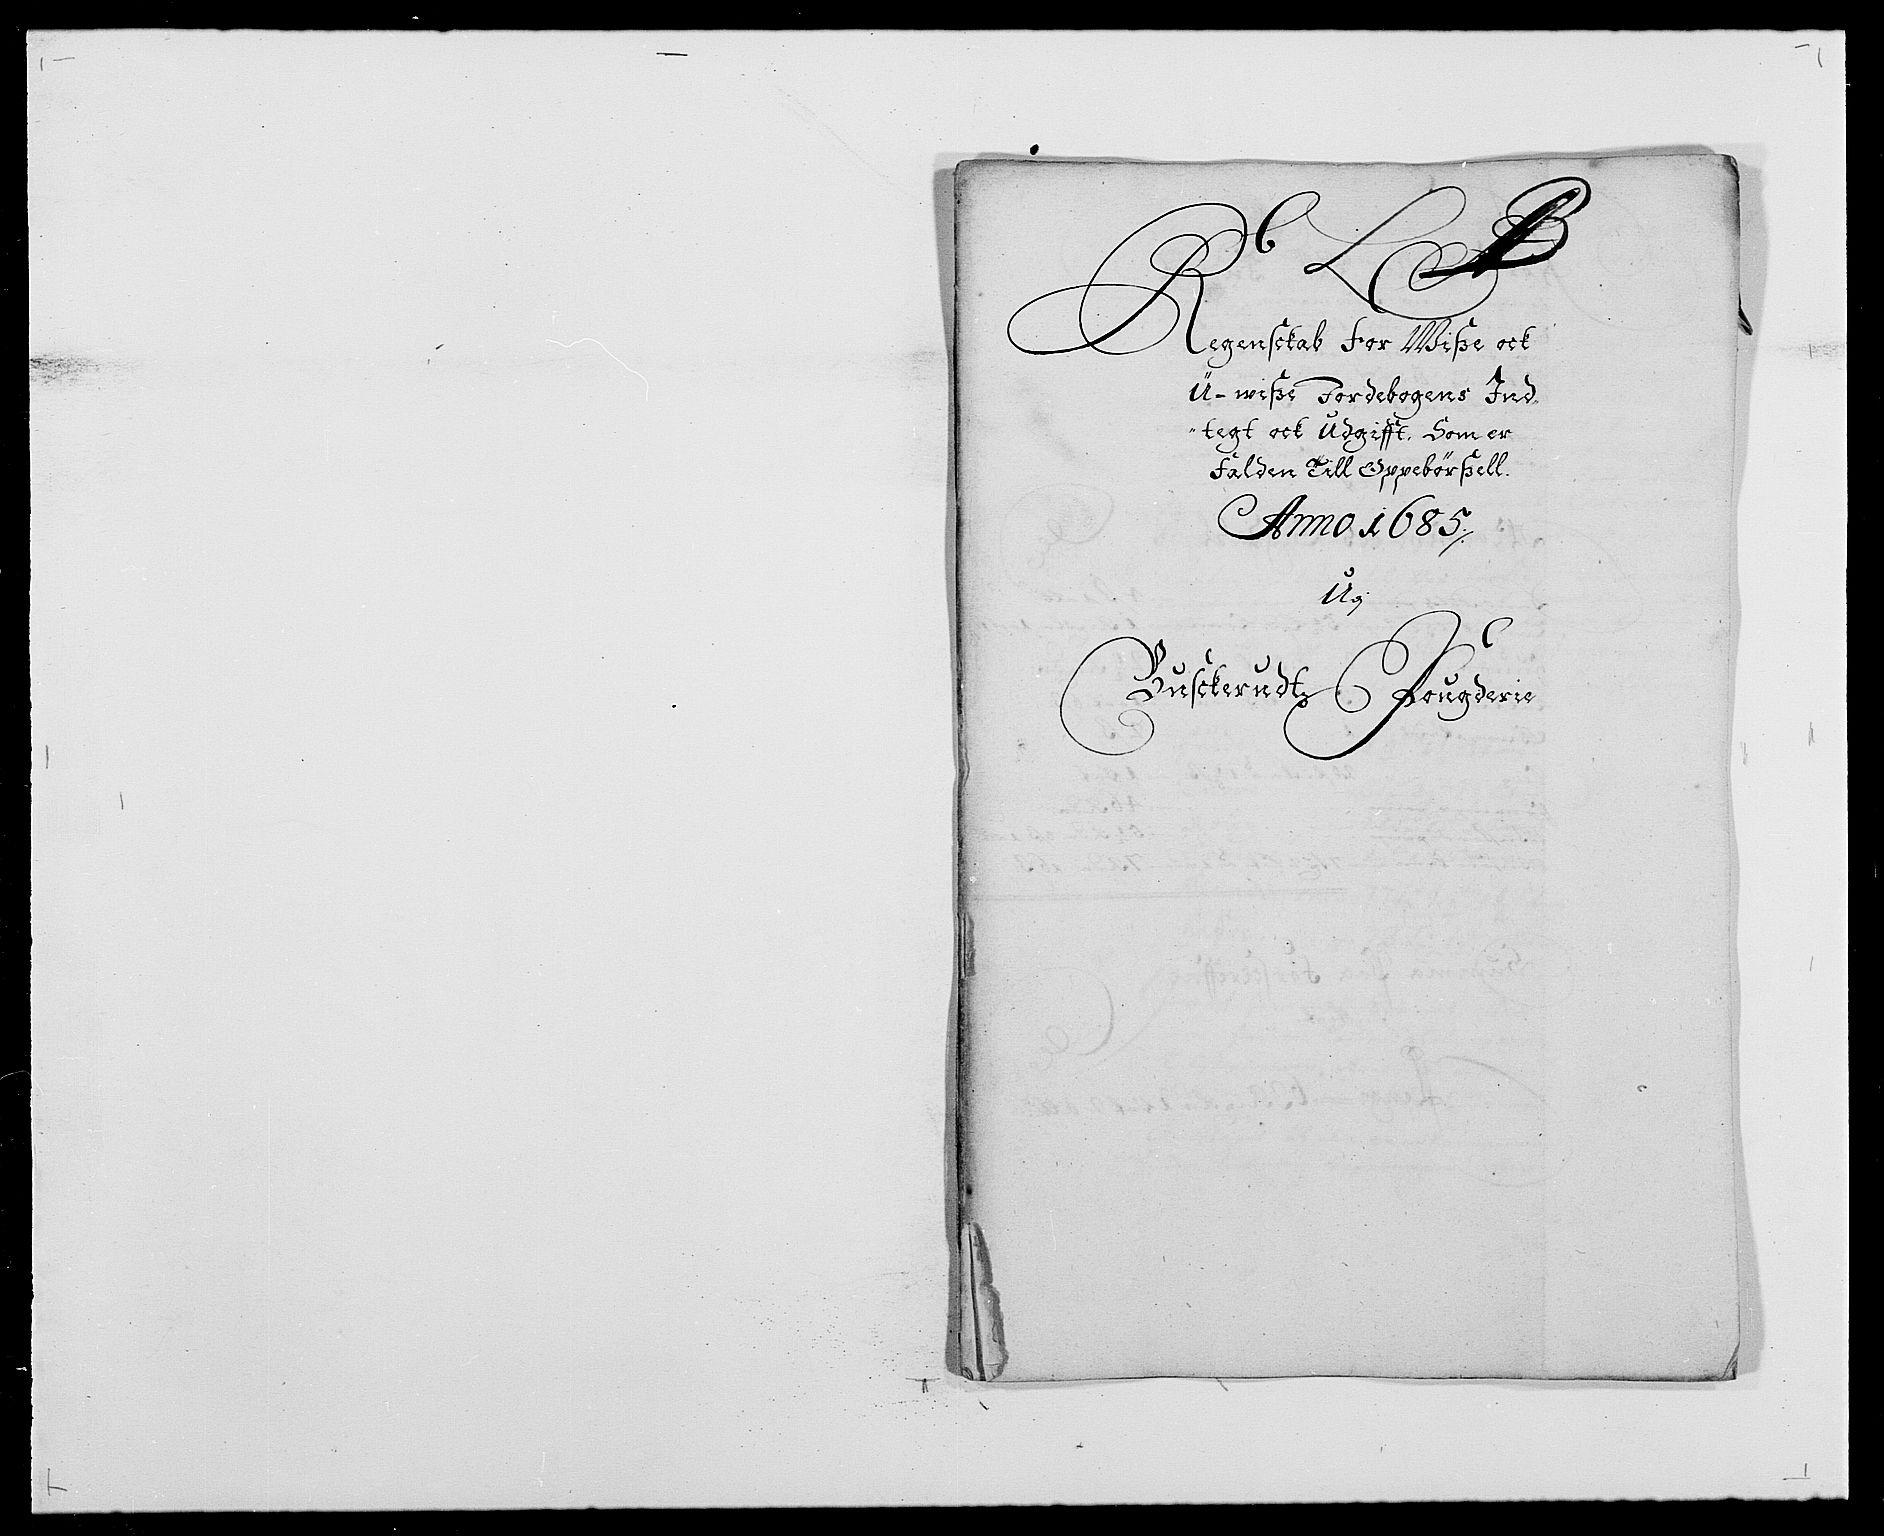 RA, Rentekammeret inntil 1814, Reviderte regnskaper, Fogderegnskap, R25/L1678: Fogderegnskap Buskerud, 1685-1686, s. 29